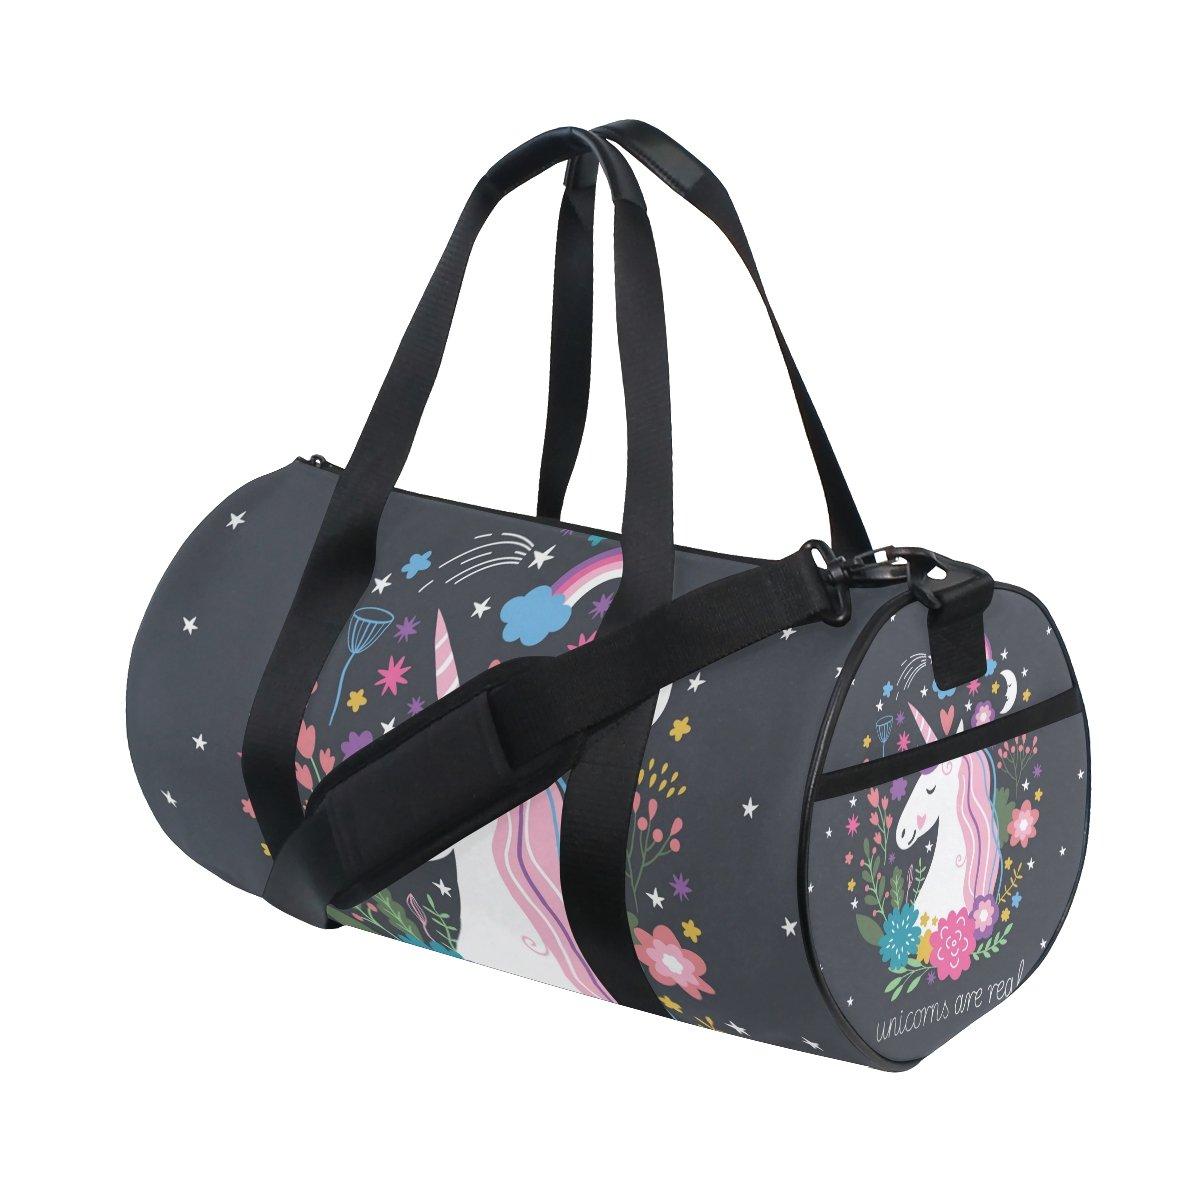 9ebab68482a0 ALIREA Unicorn Duffle bag Shoulder Handy Sports Gym Bags for Men and Women